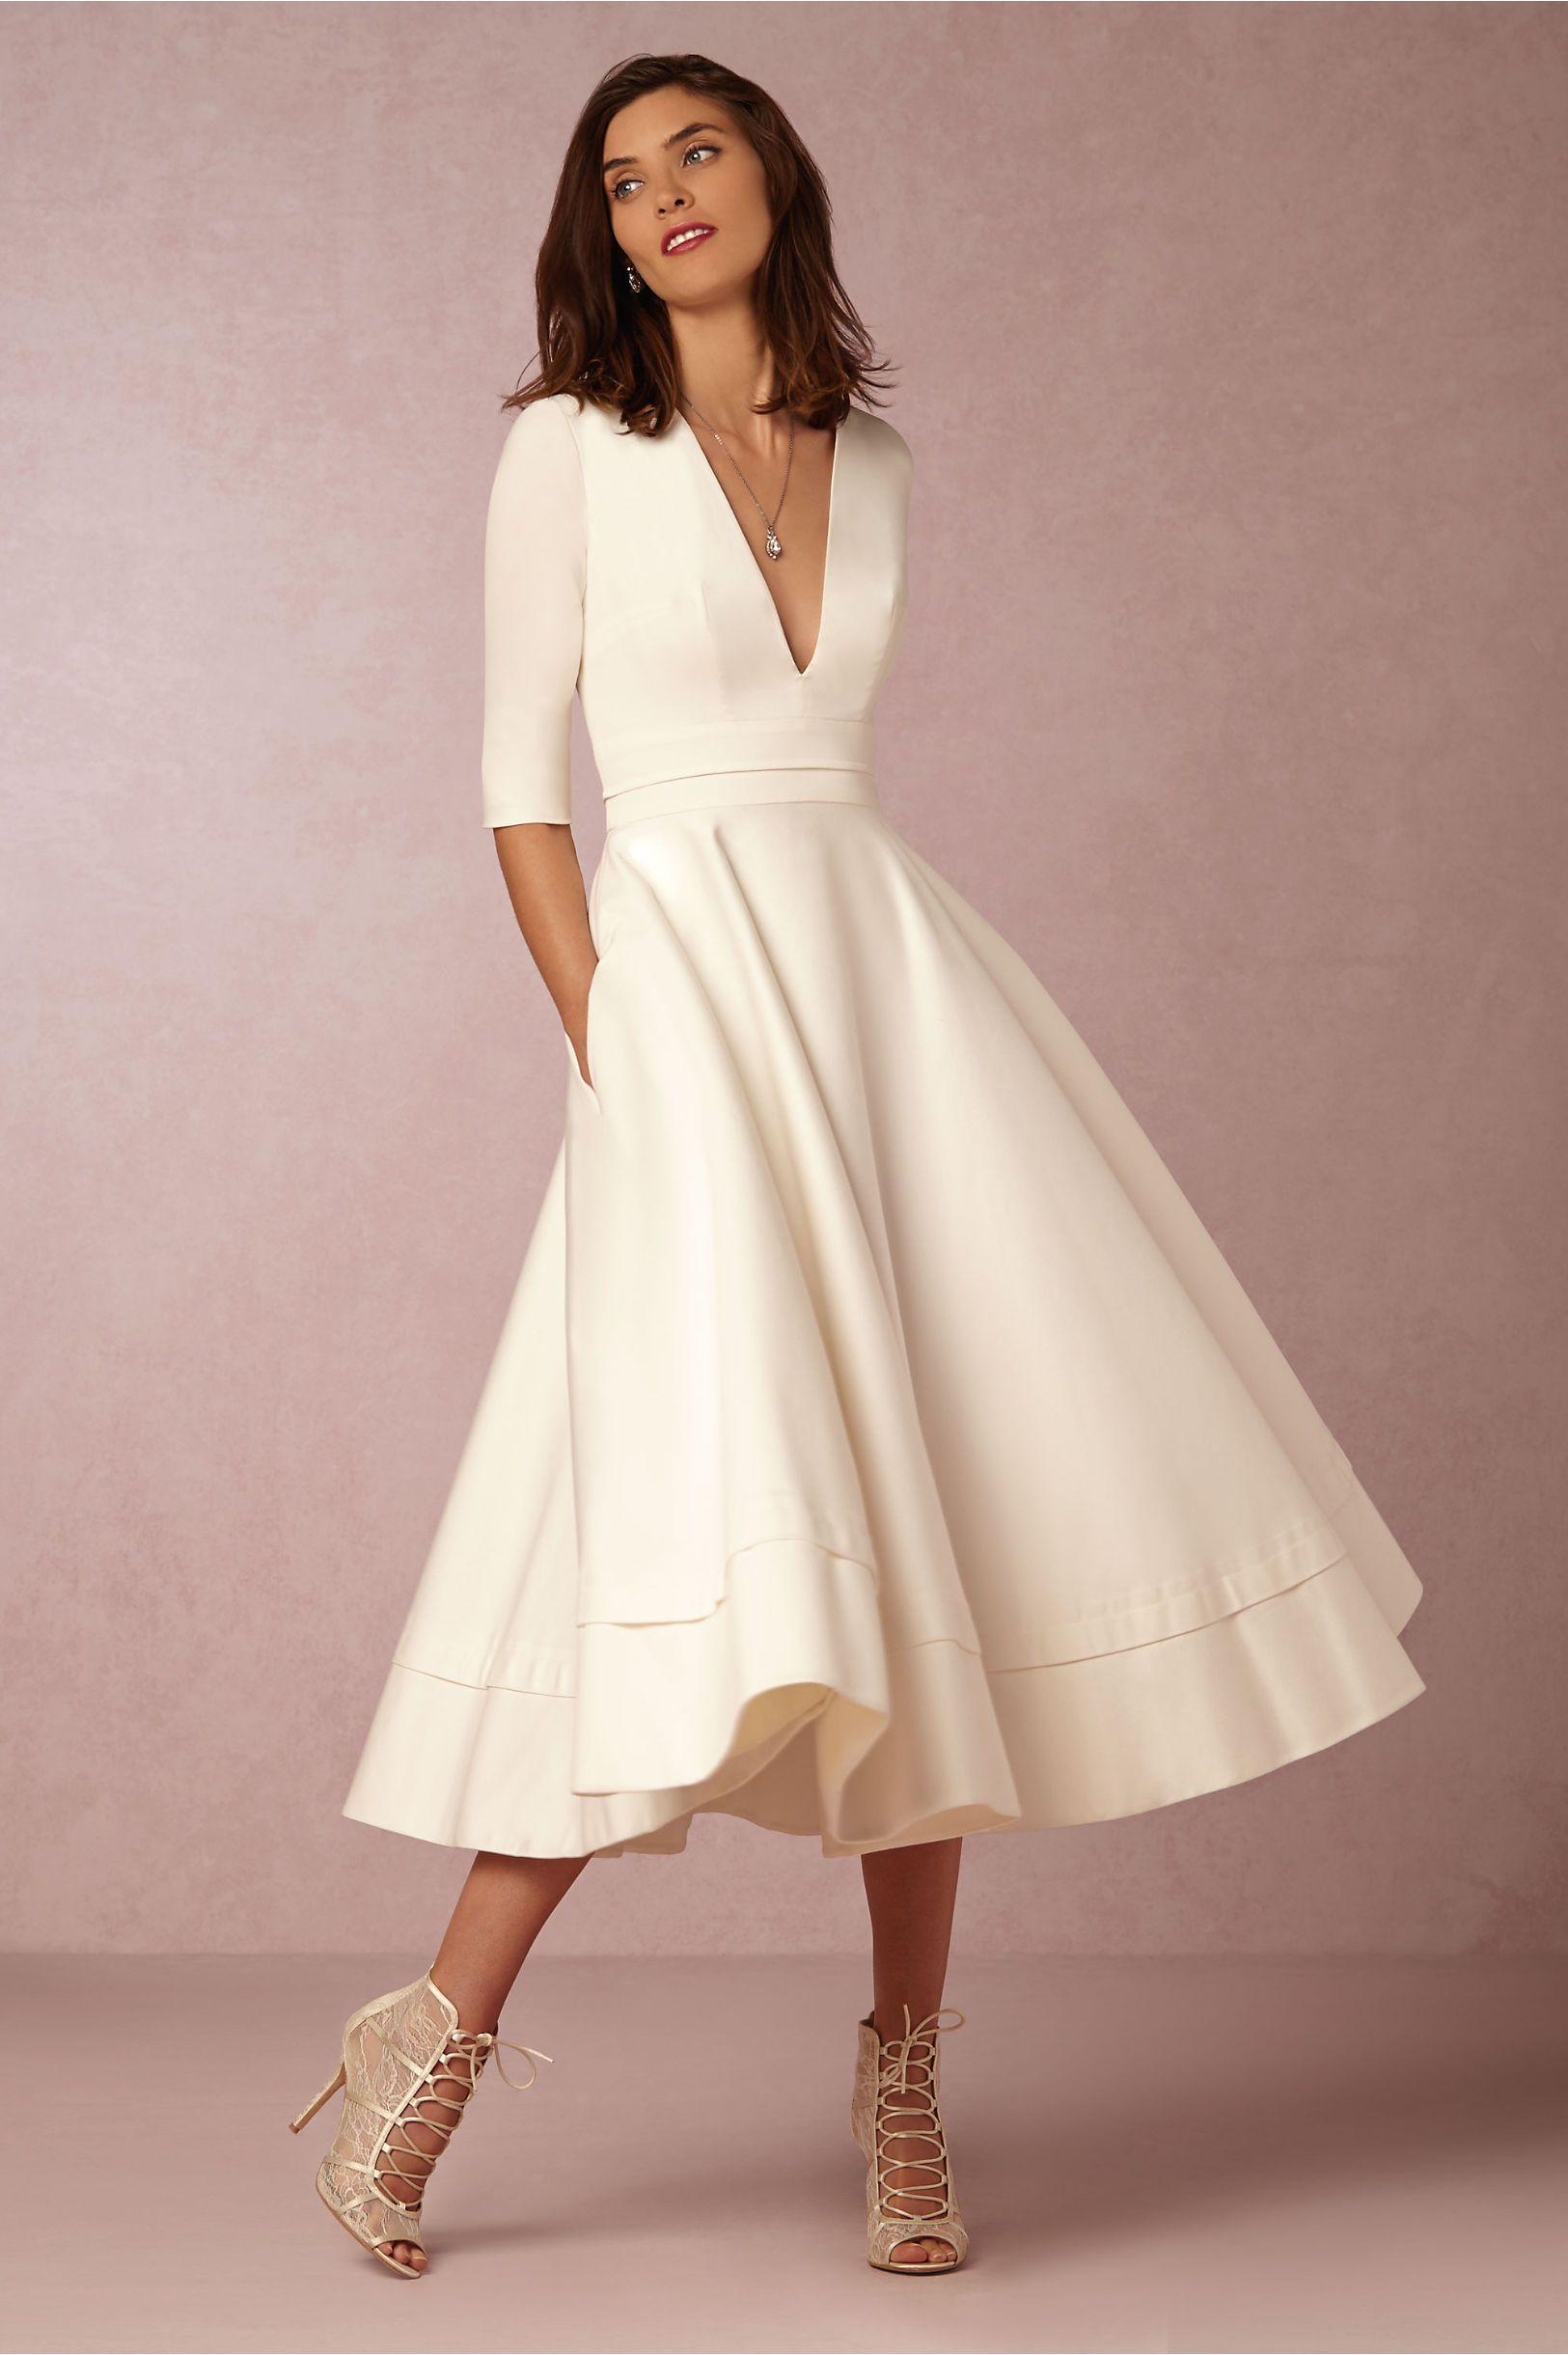 Kennedy gown fashion pinterest high point fashion forward and